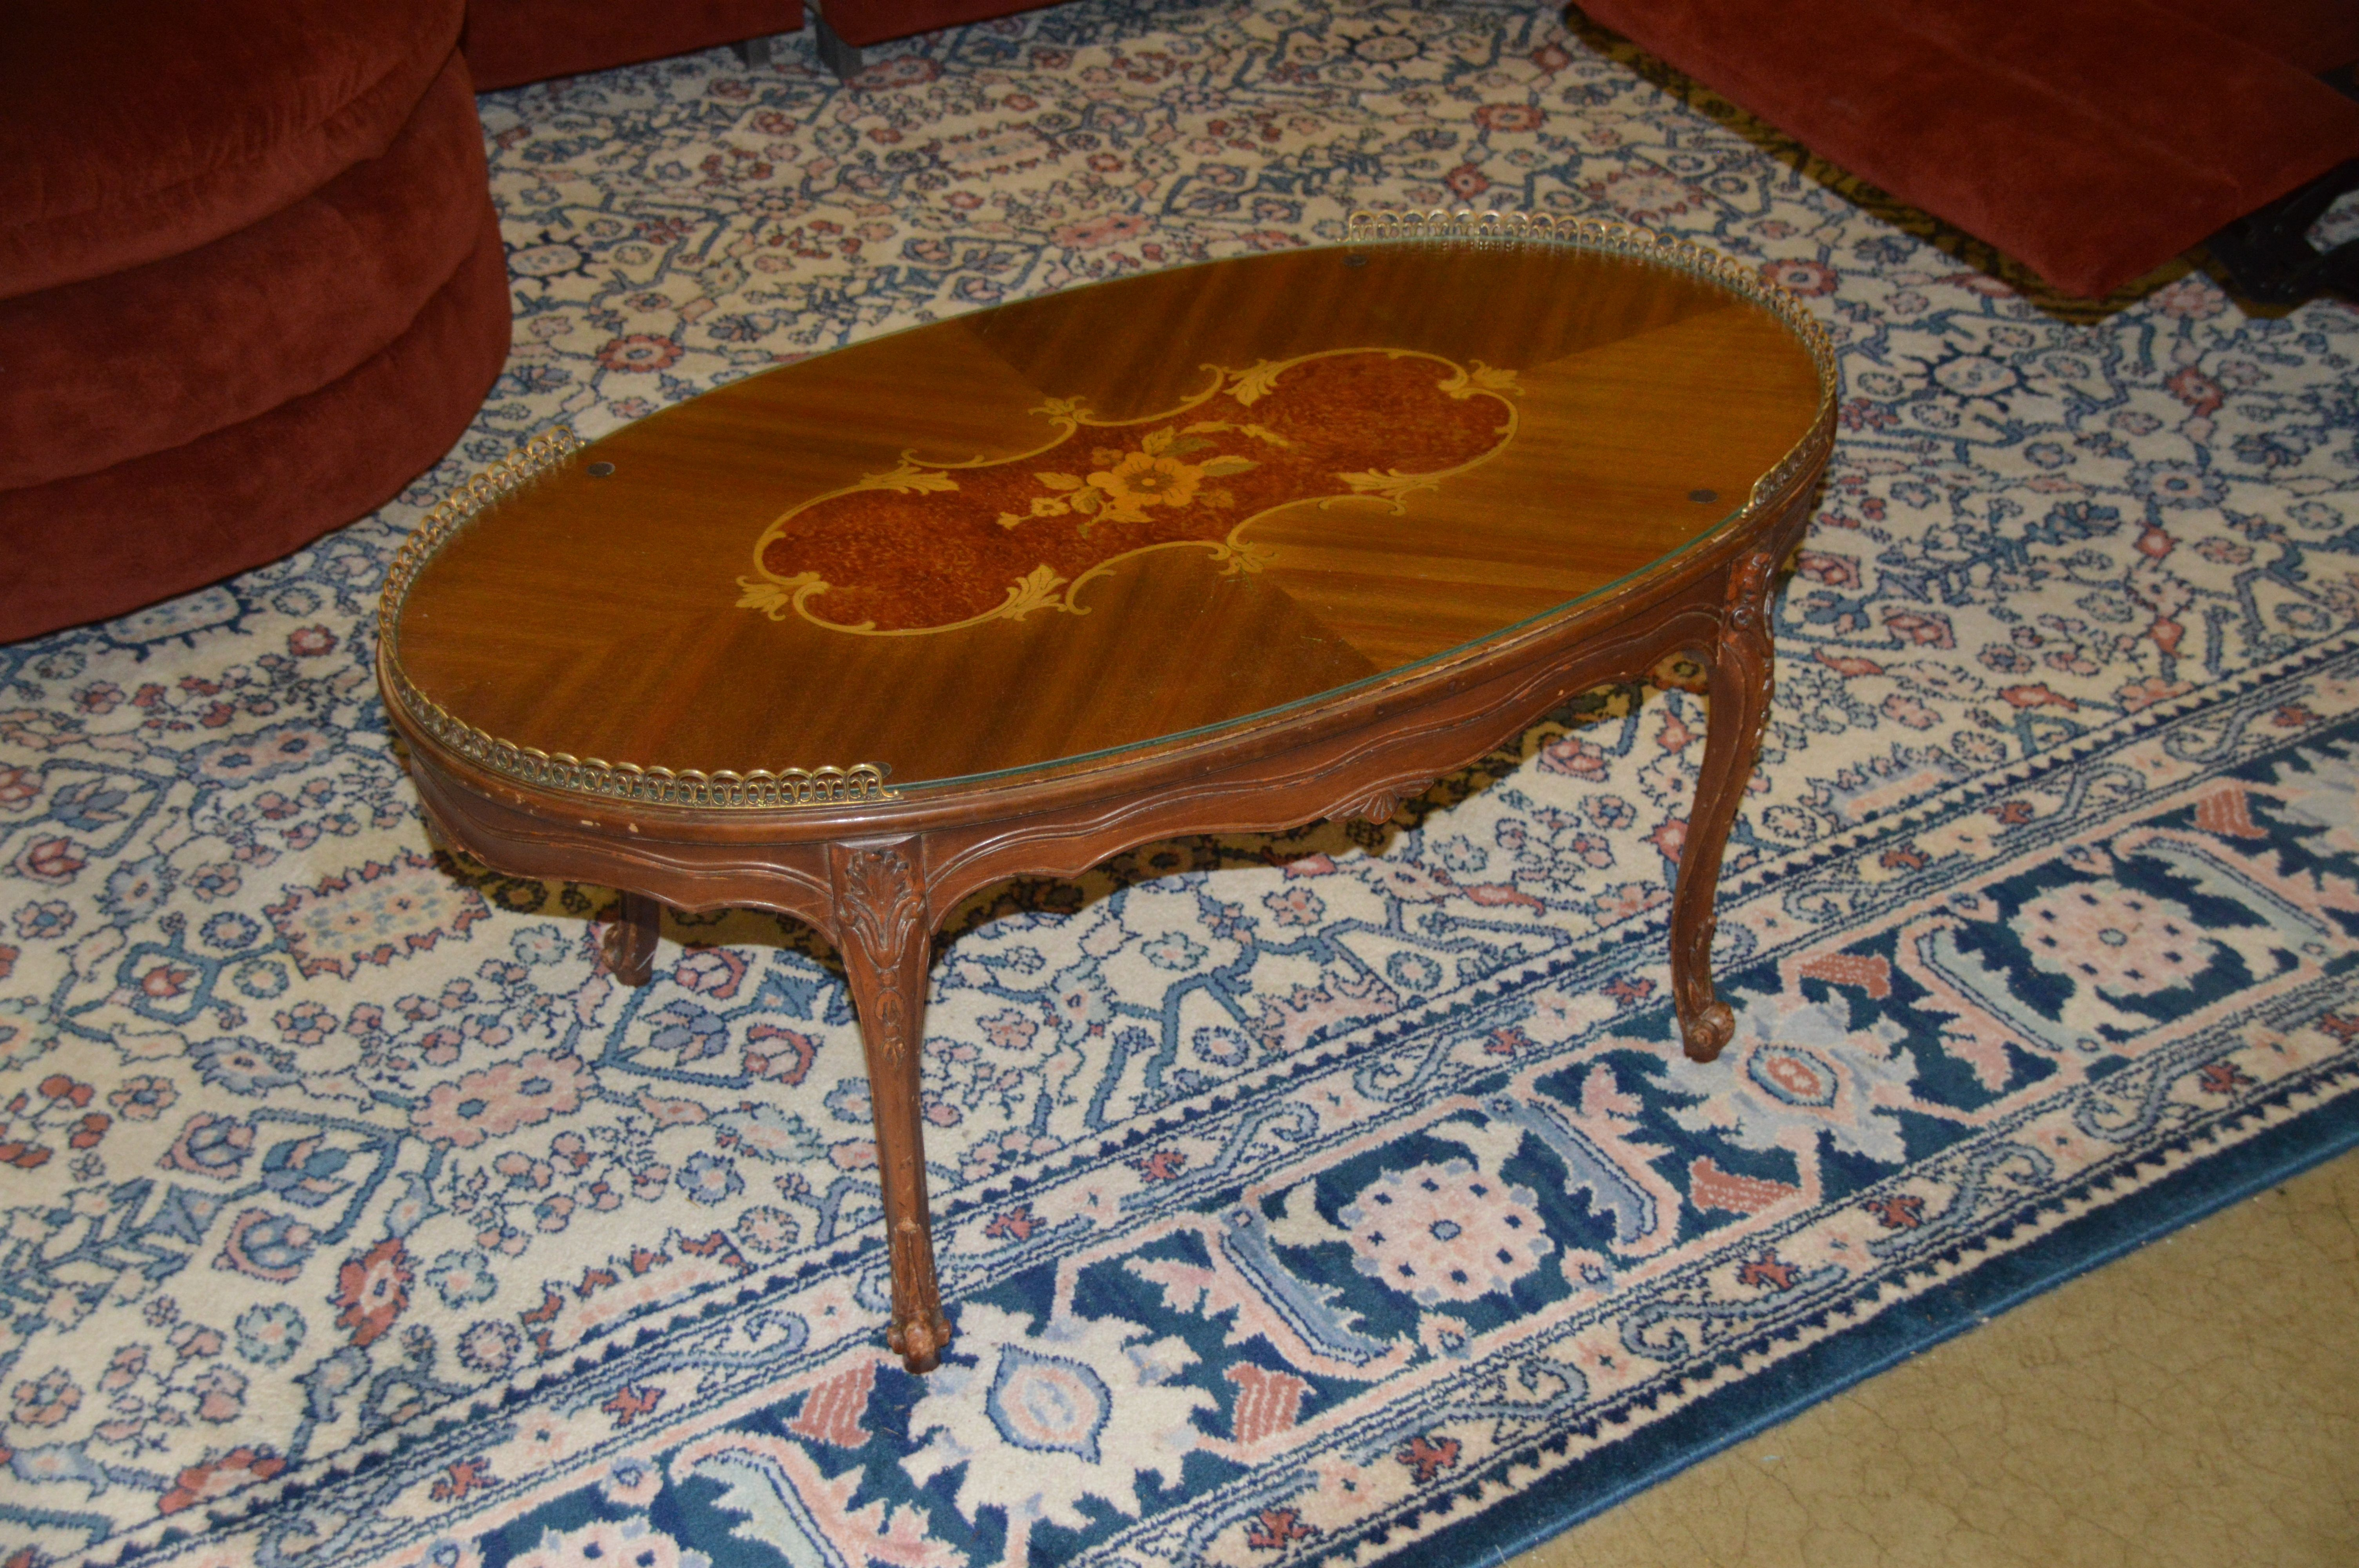 Vintage Coffee Table Coffee Table Vintage Coffee Table Antique Collection [ 4000 x 6016 Pixel ]